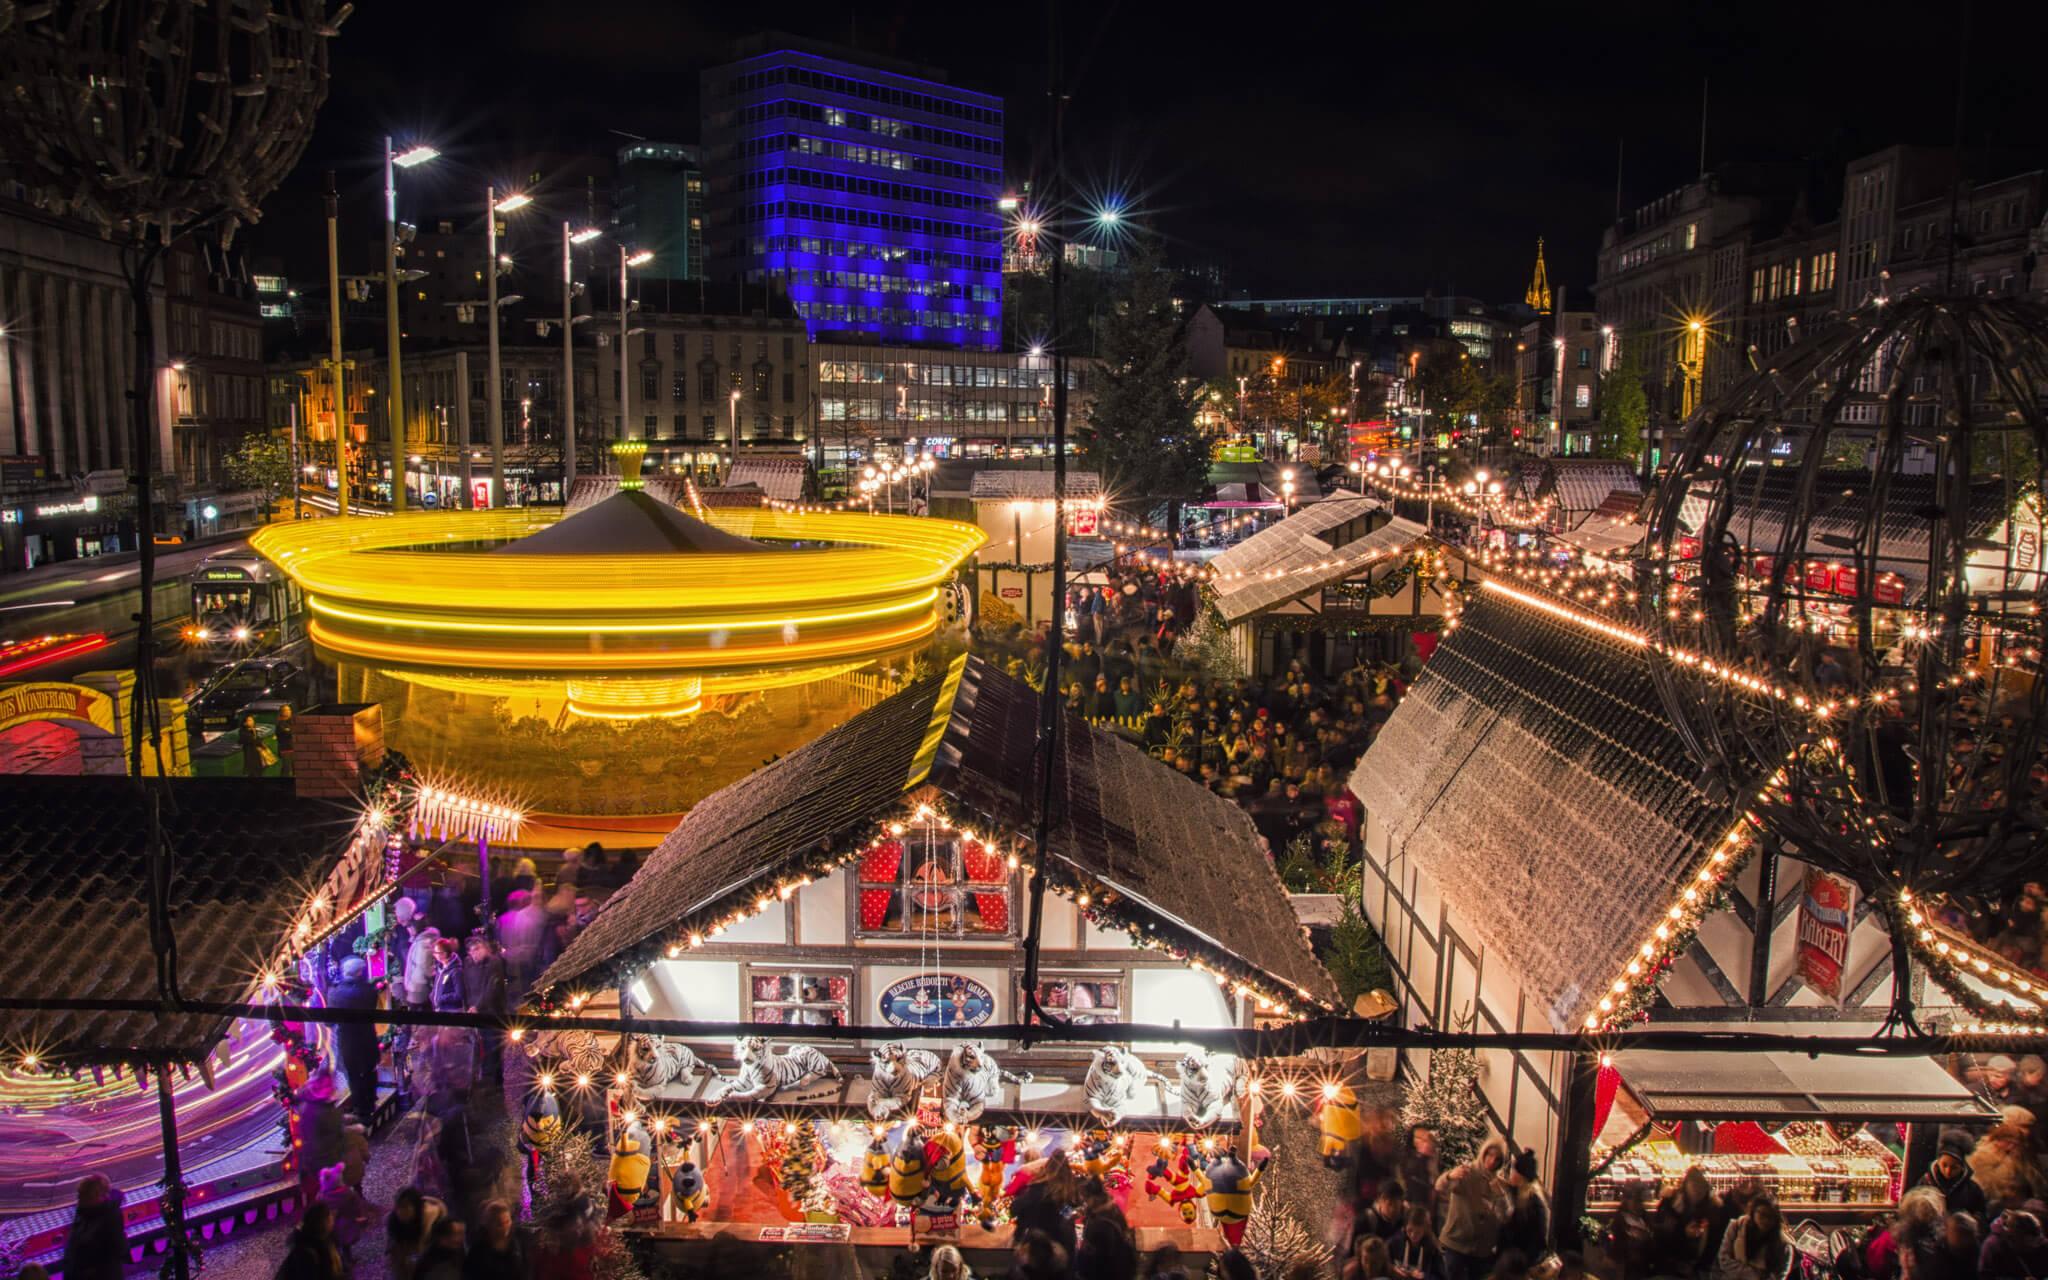 Nottingham Christmas market at night